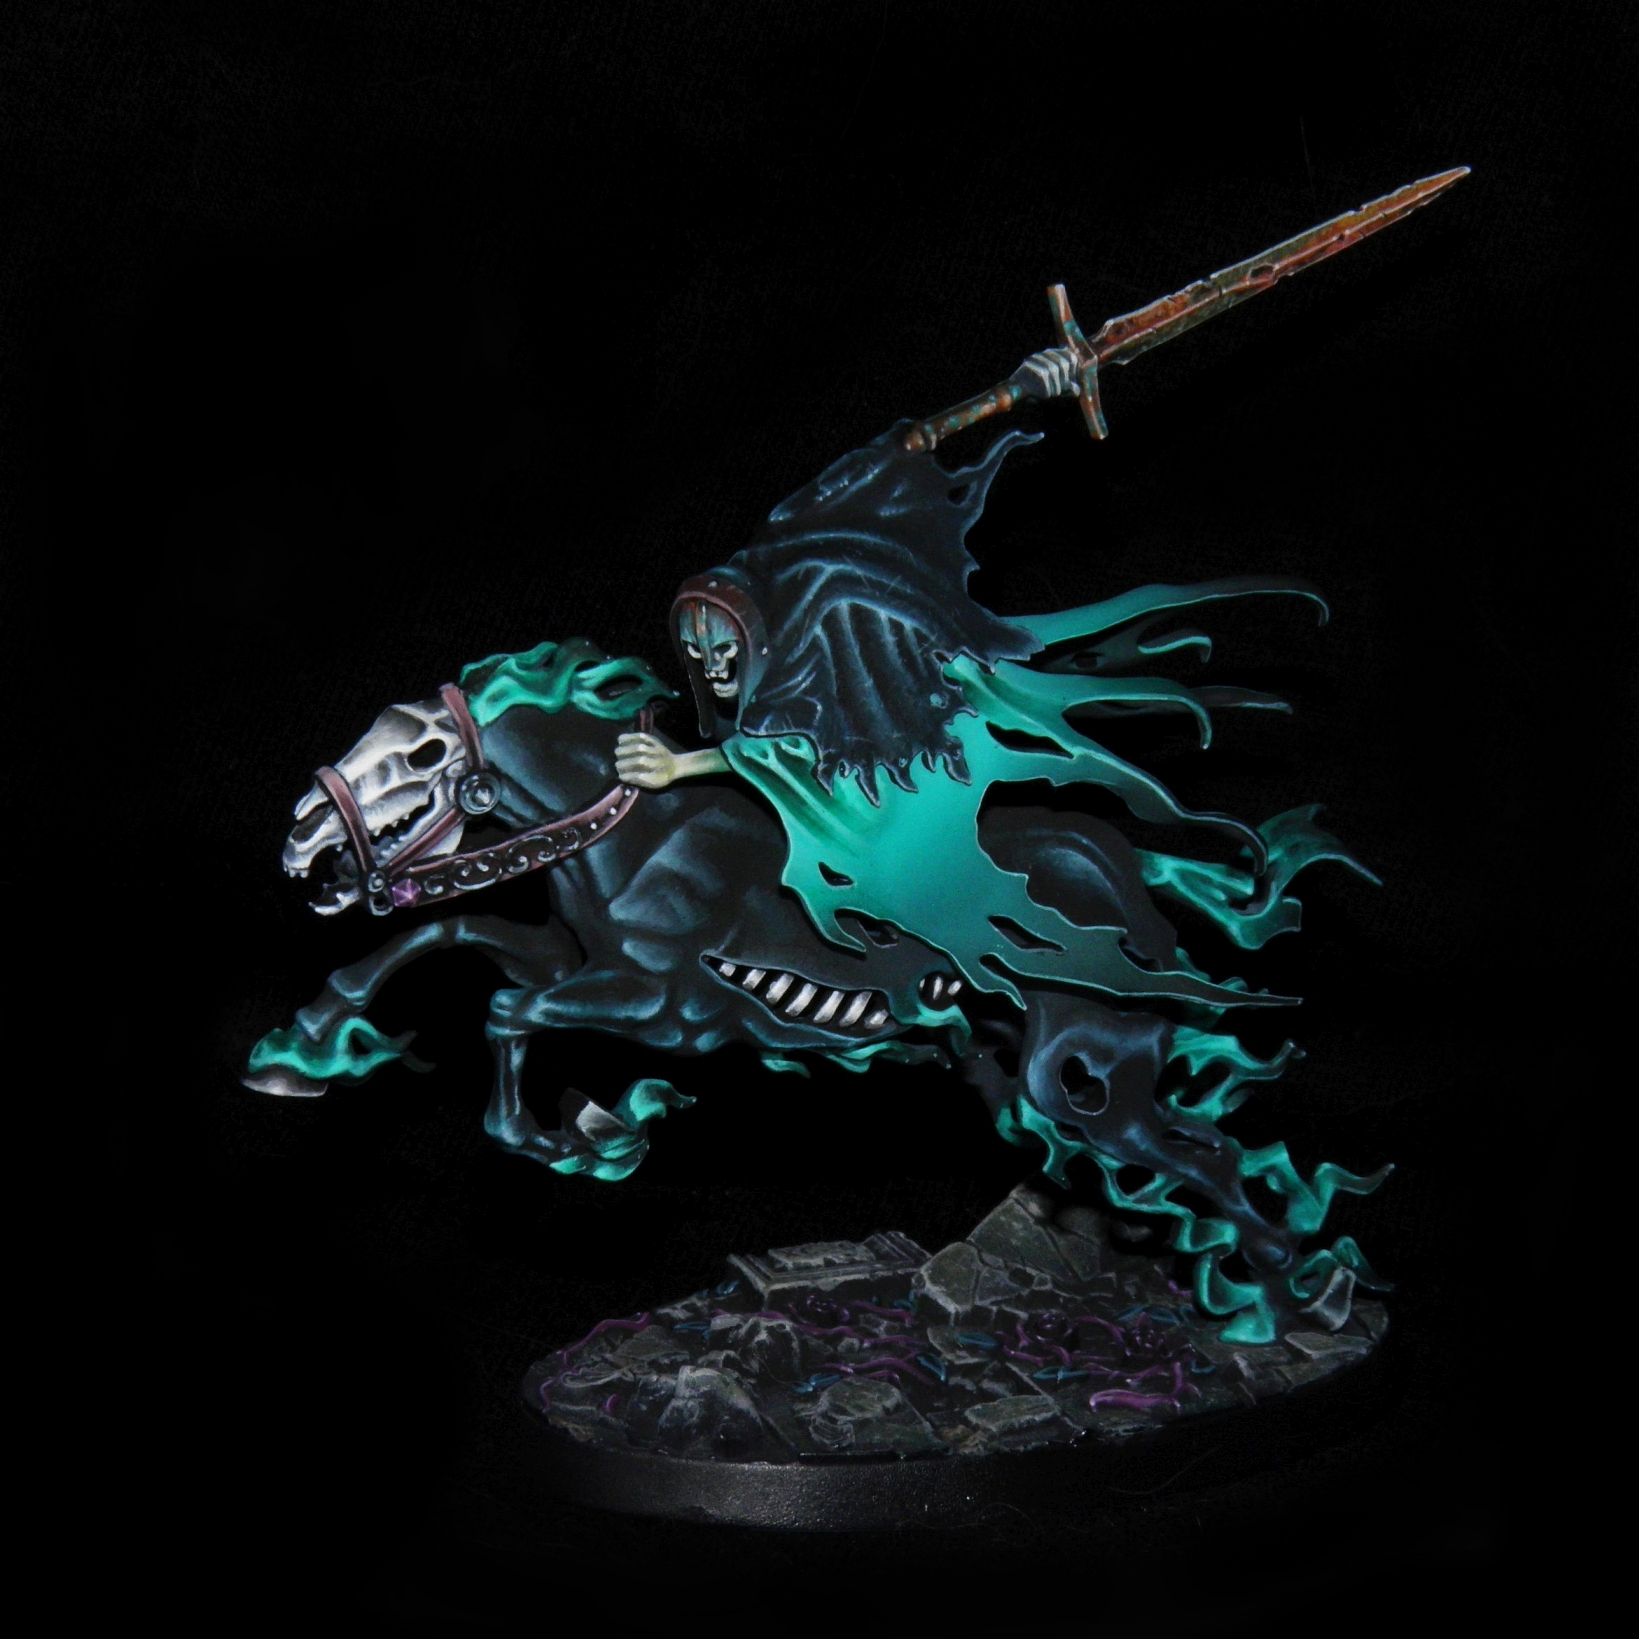 Nighthaunt Dreadblade Harrow (better quality)